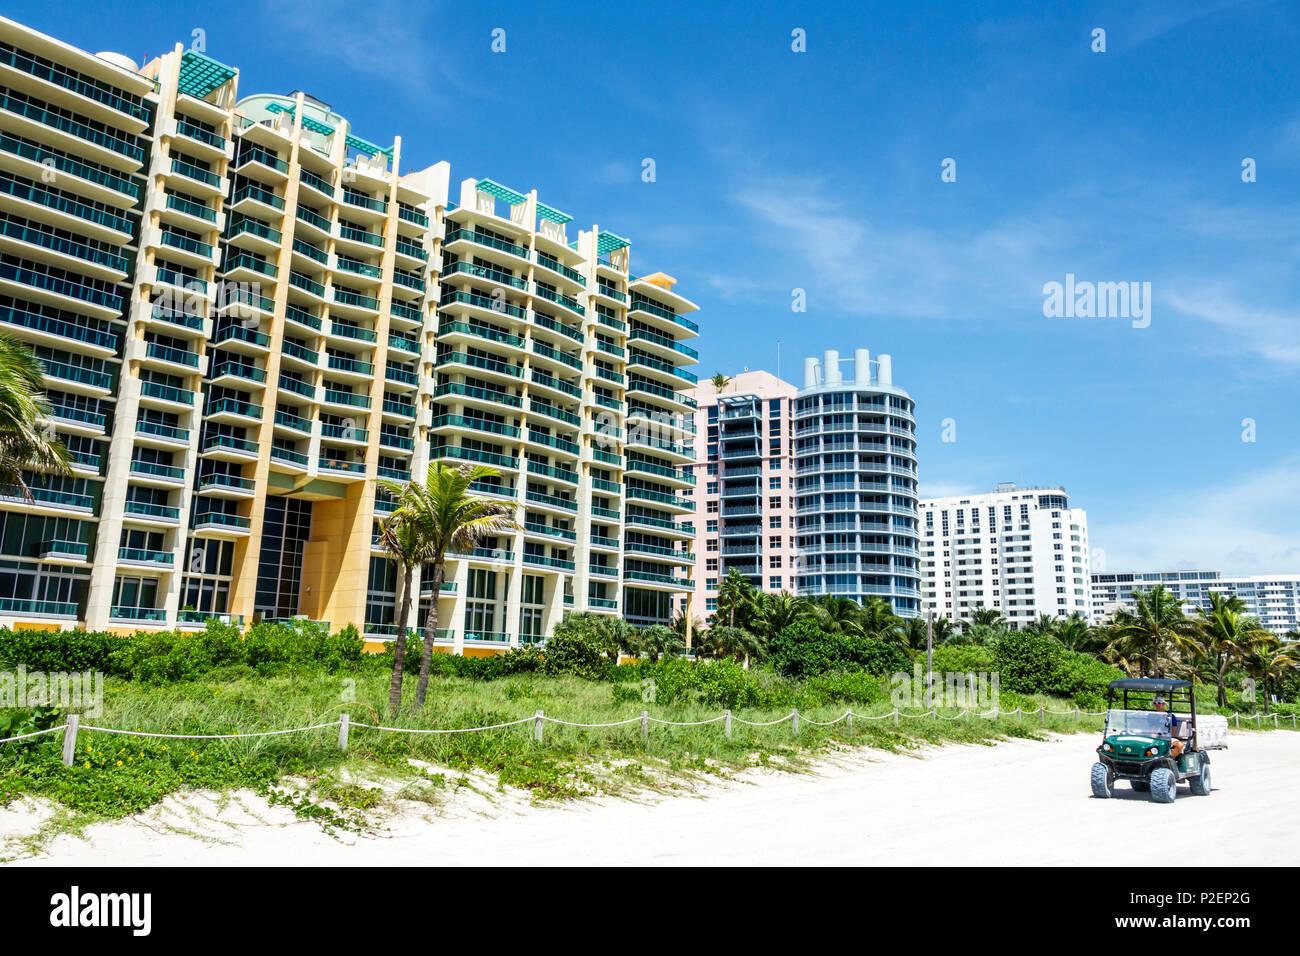 Florida Miami Beach Beachfront High Rise Condominium Buildings Il Villaggio  South Beach Luxury Real Estate Sand Dune Balcony Balconies Oceanfront